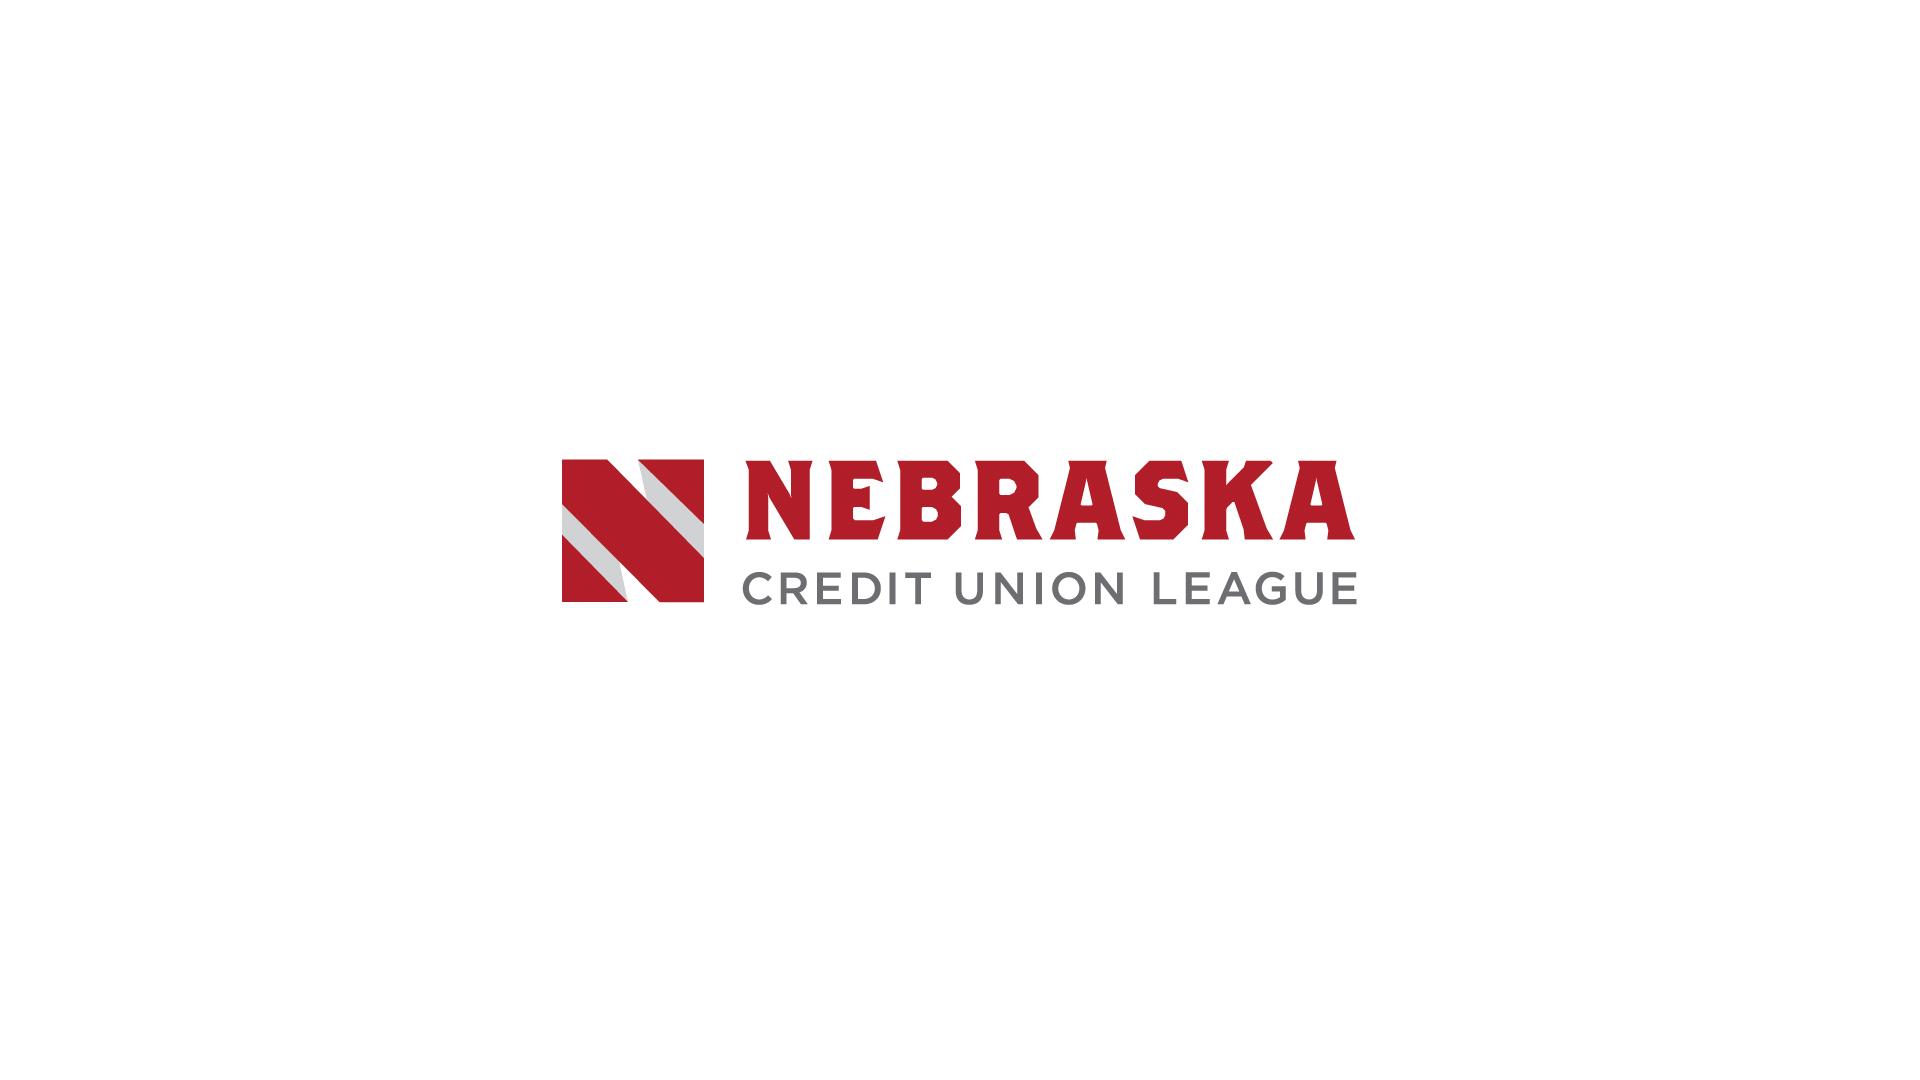 NCUL Nebraska Credit Union League HR On Demand handout print by Agency 877